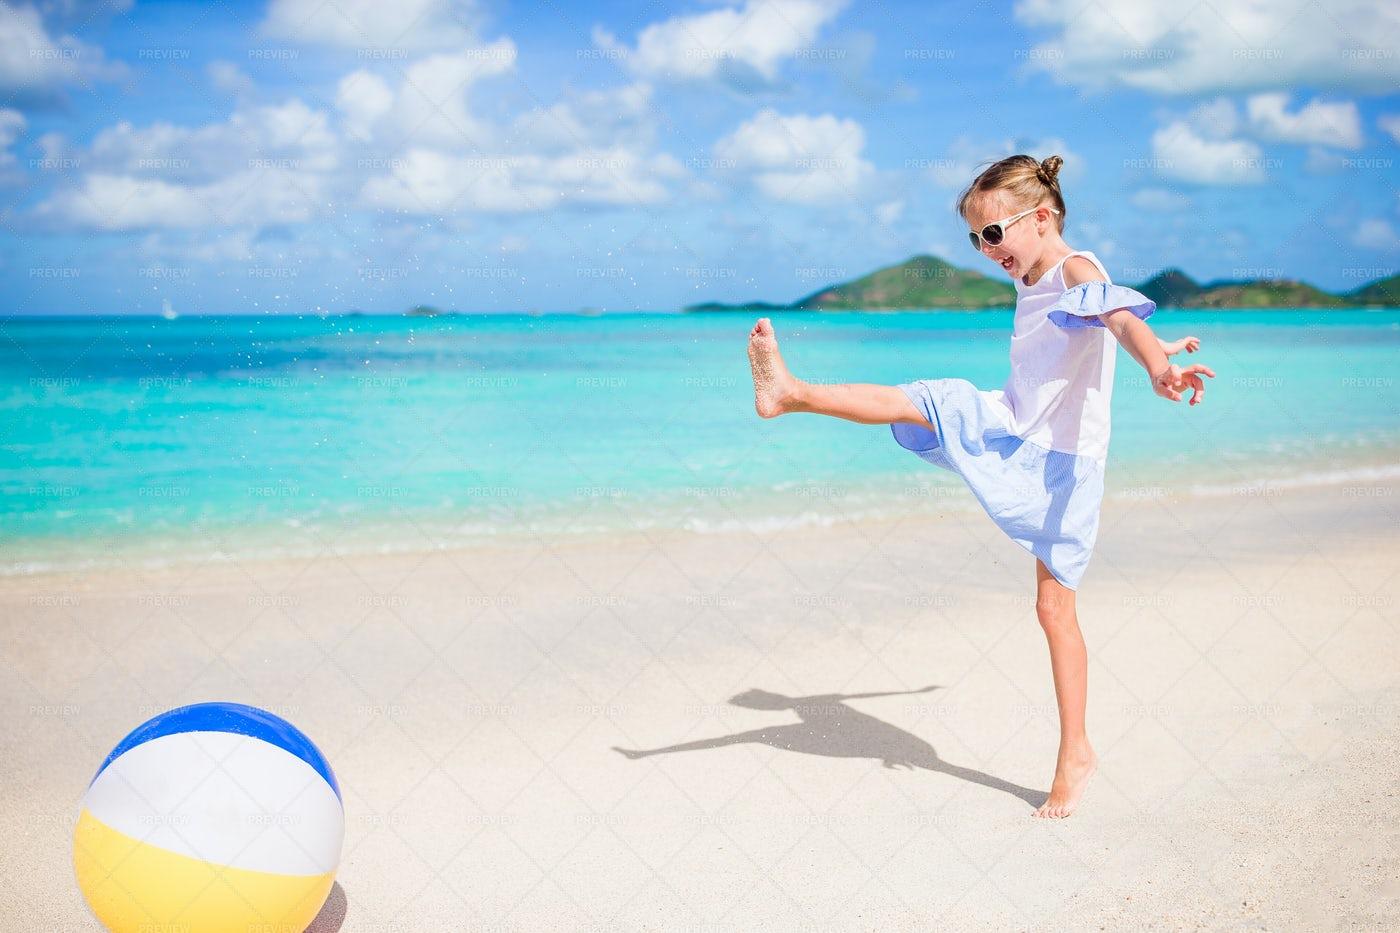 Girl Playing With Ball: Stock Photos